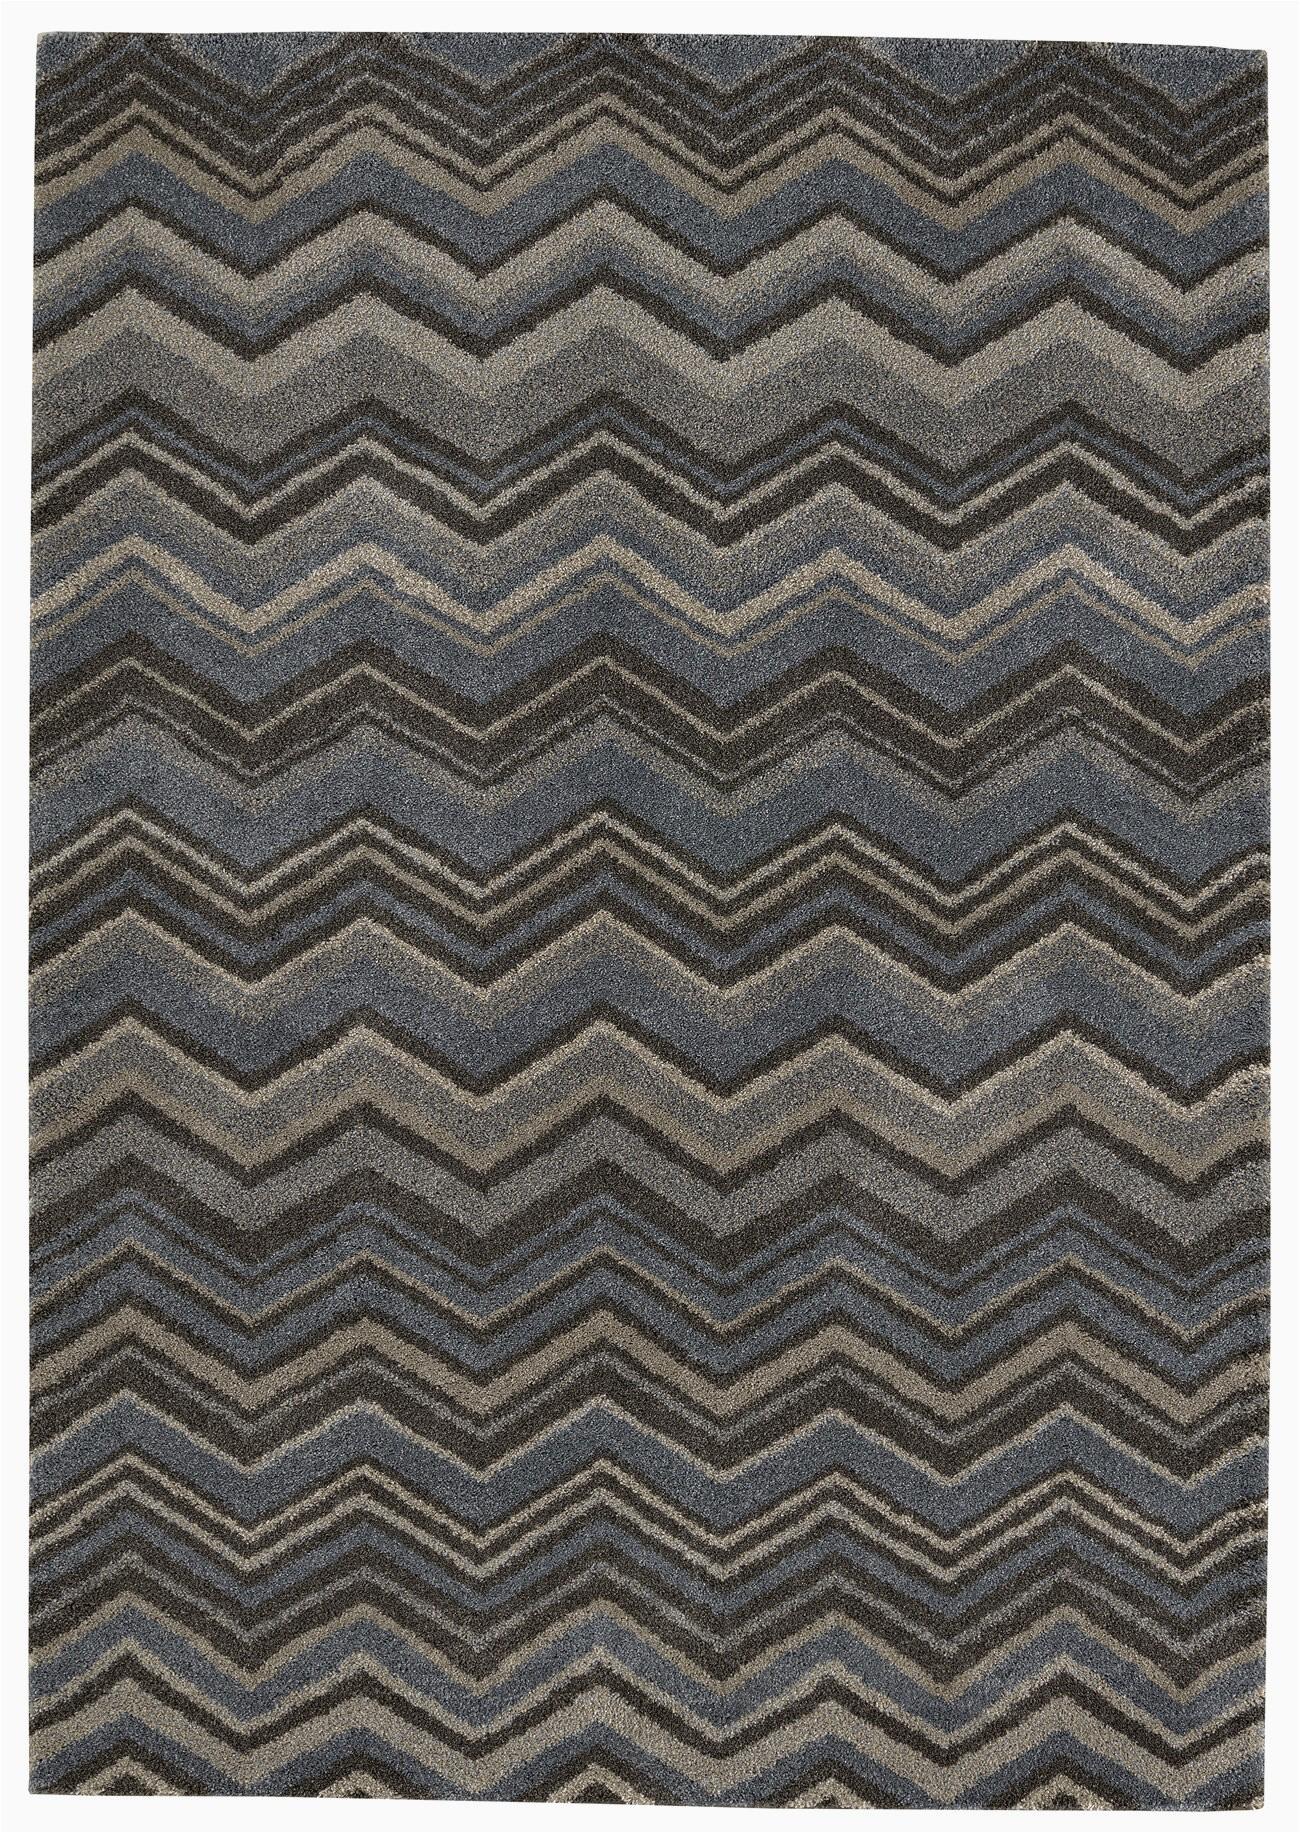 ebern designs elmwood bluegray area rug bx2825 piid=